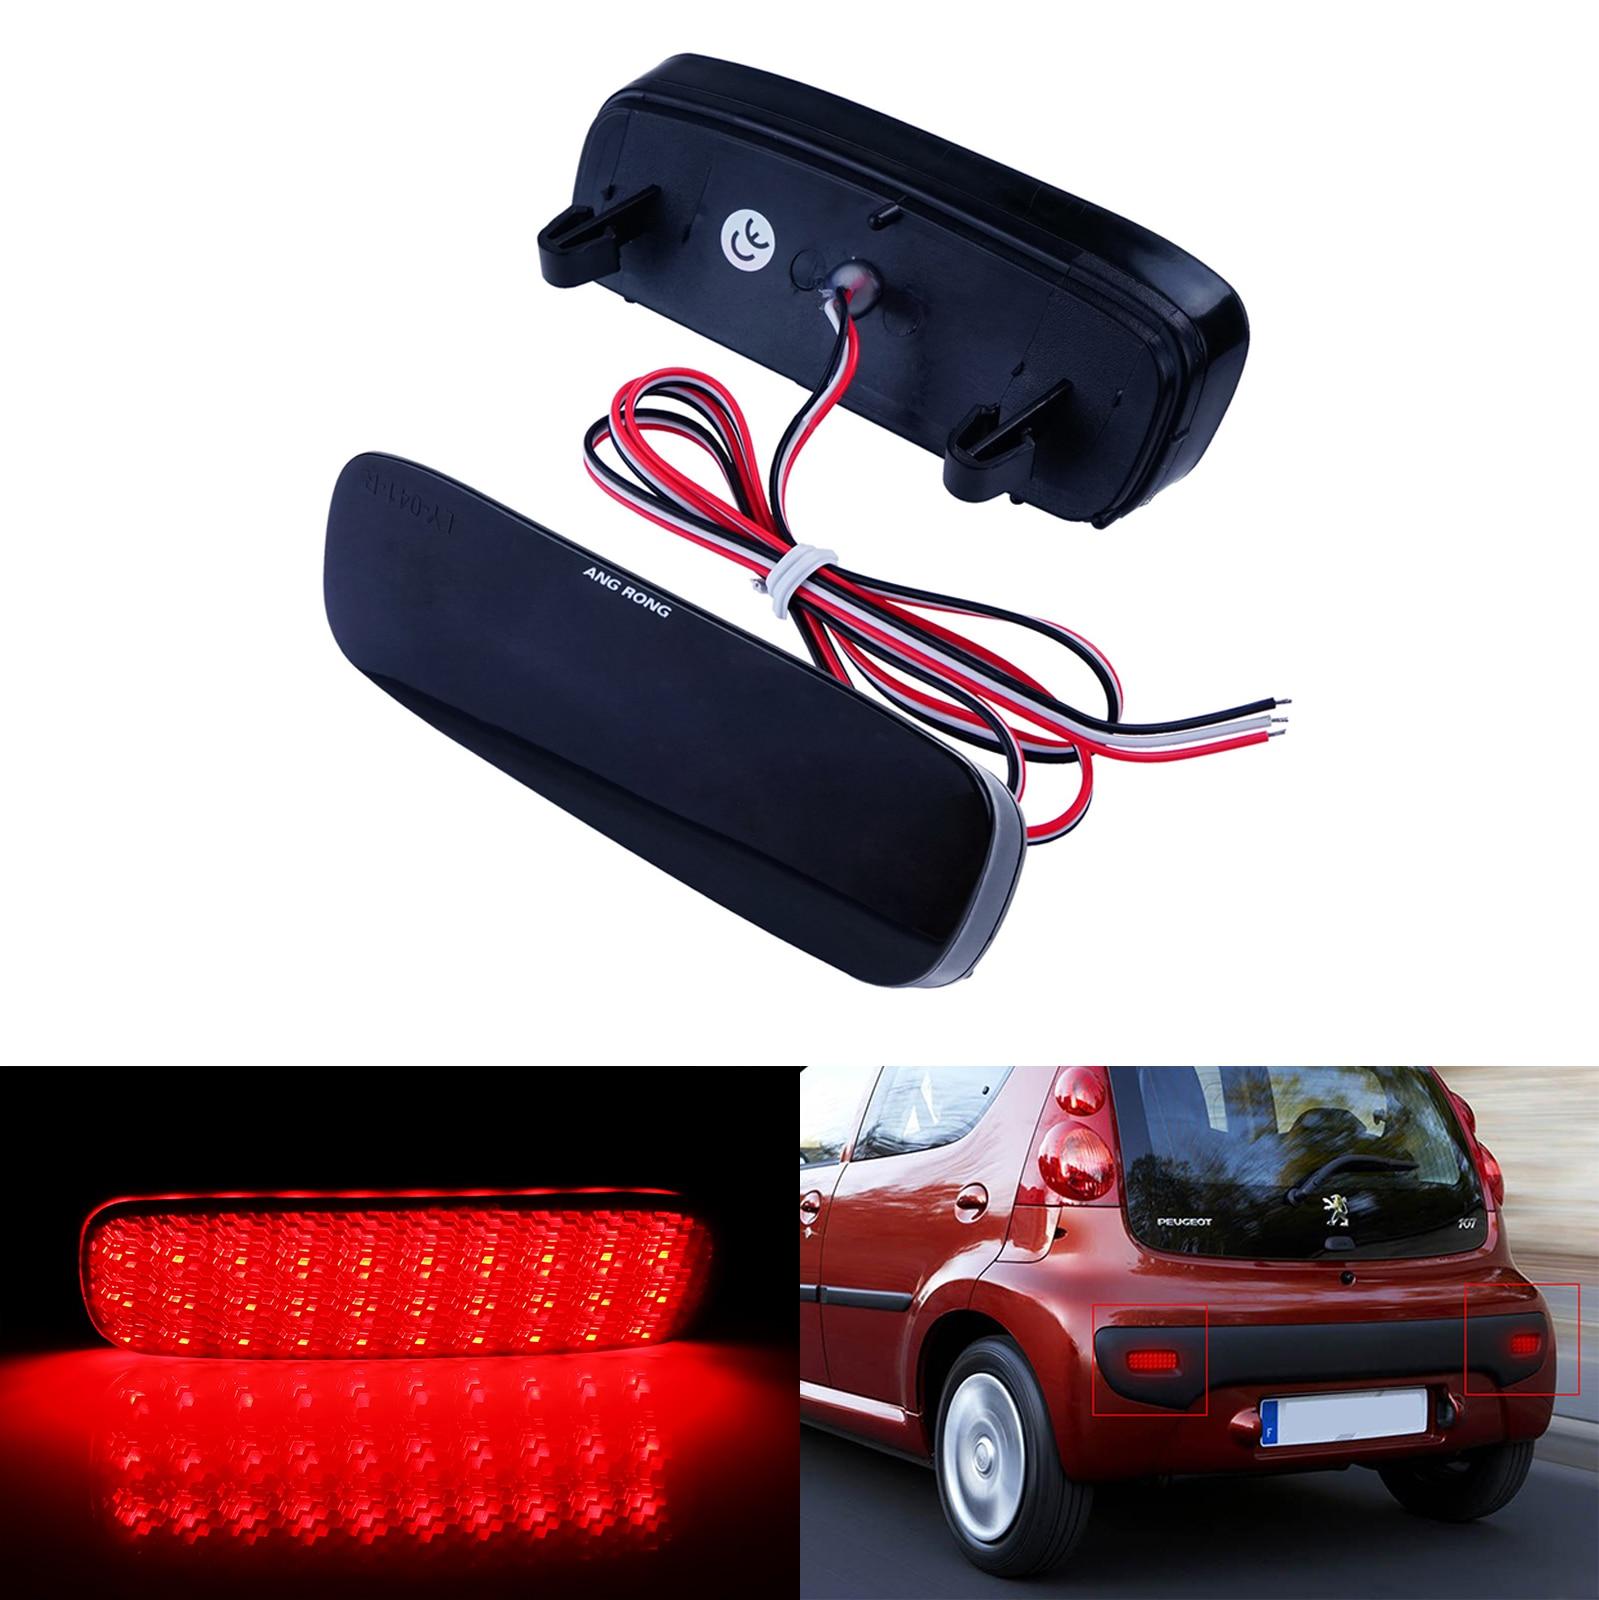 ANGRONG 2X Red LED Rear Bumper Reflector Light For Citroen C1 C5 Peugeot 107 206 607 Expert